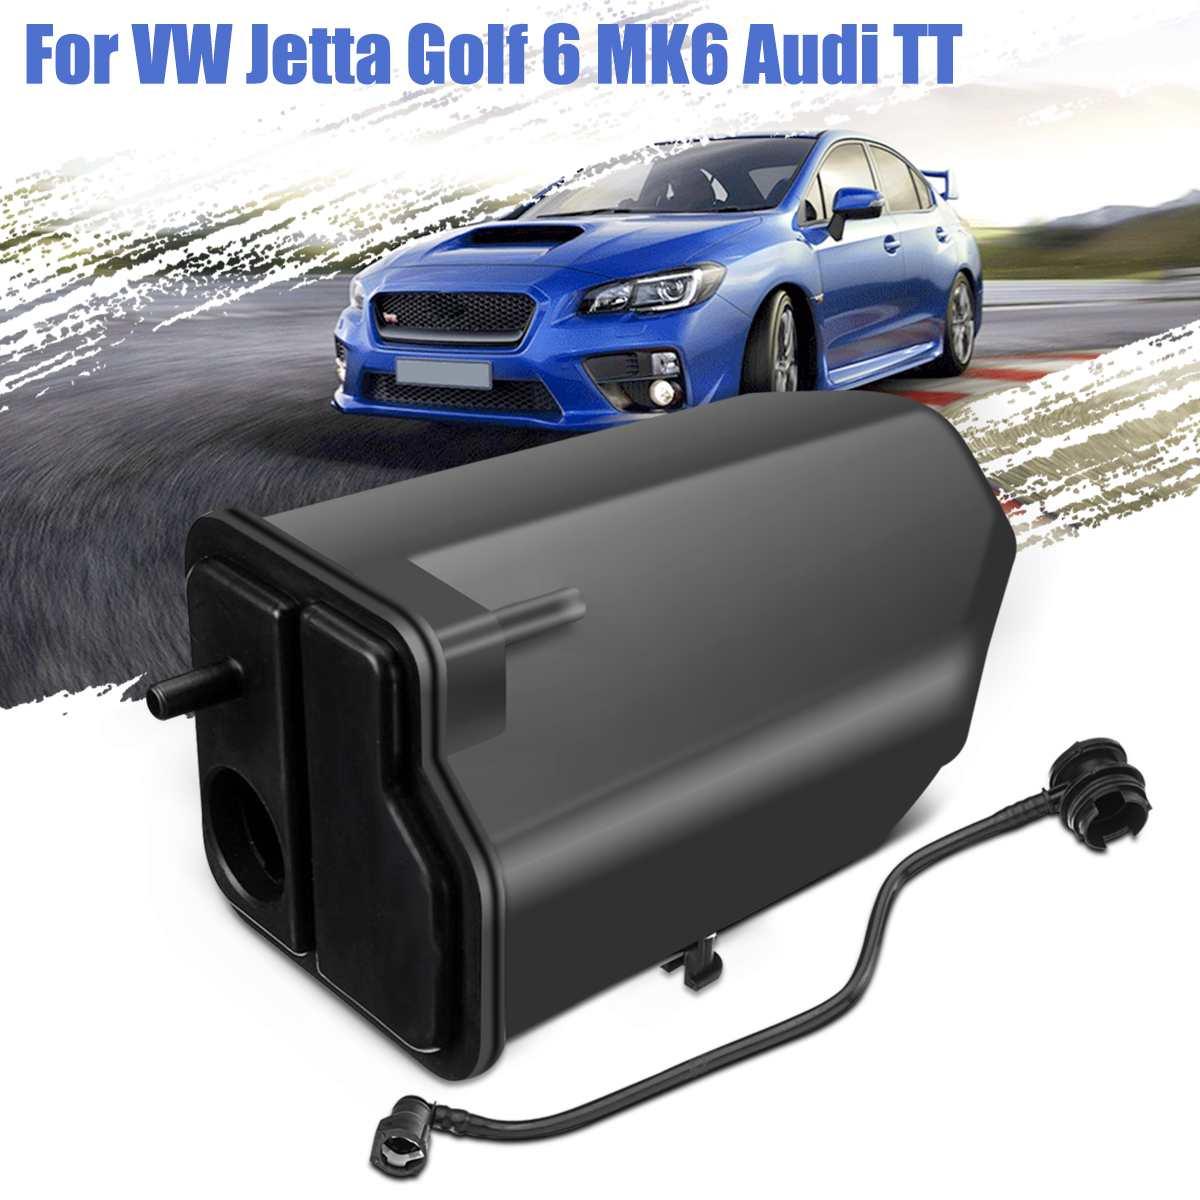 1K0201897AE 1K0201801E Auto Aktivkohle Holzkohle Kanister Dosen Für VW/Jetta Golf EOS für Audi A3 TT